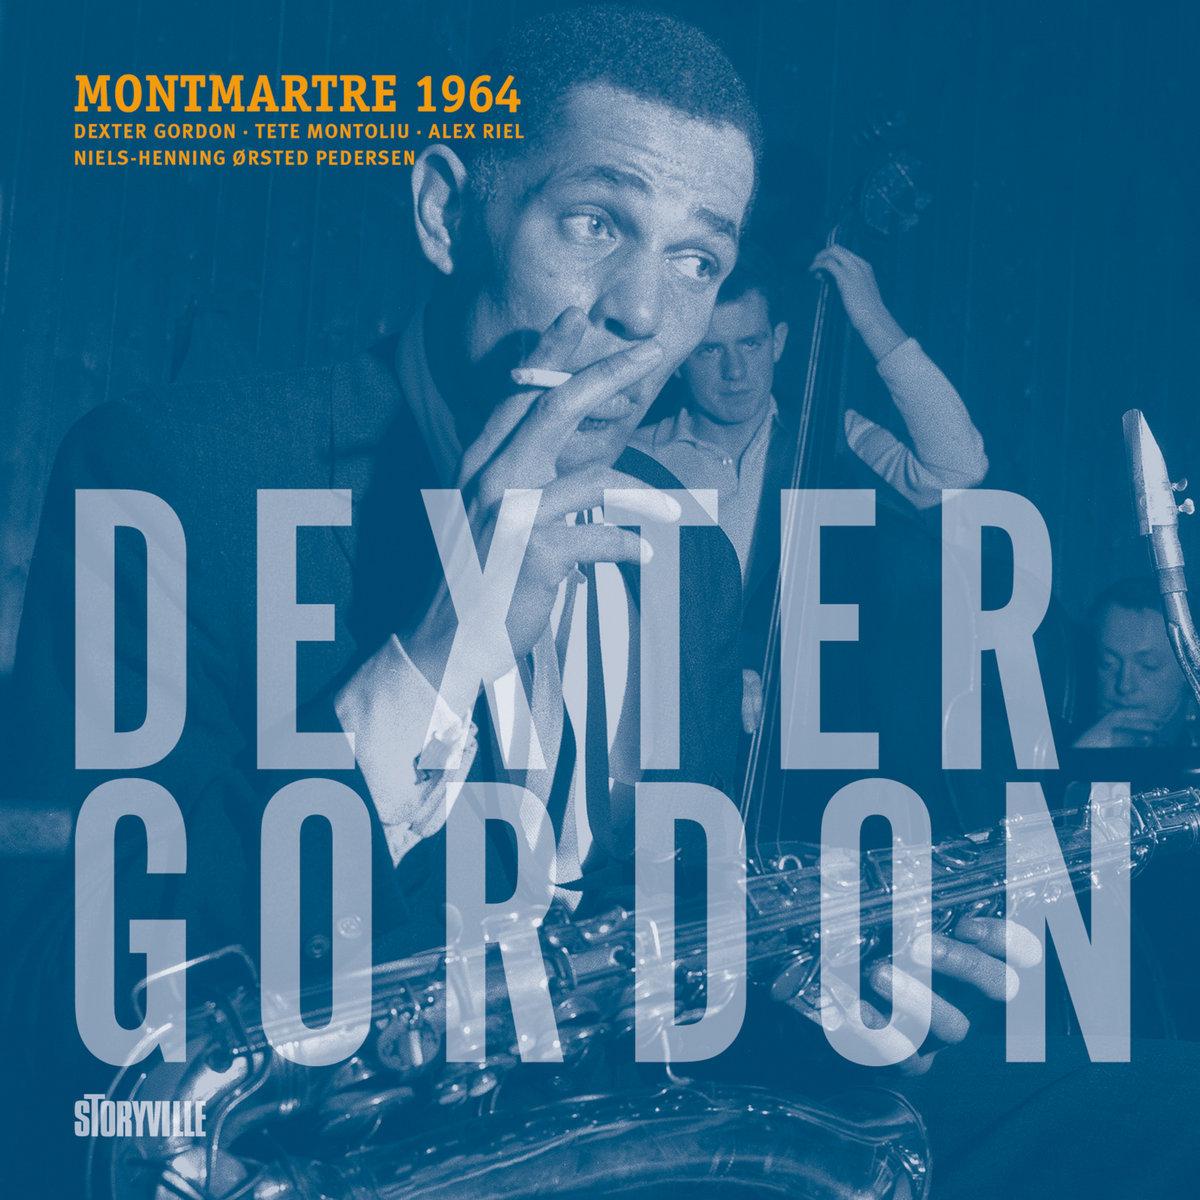 Montmartre 1964 | Dexter Gordon | Storyville Records